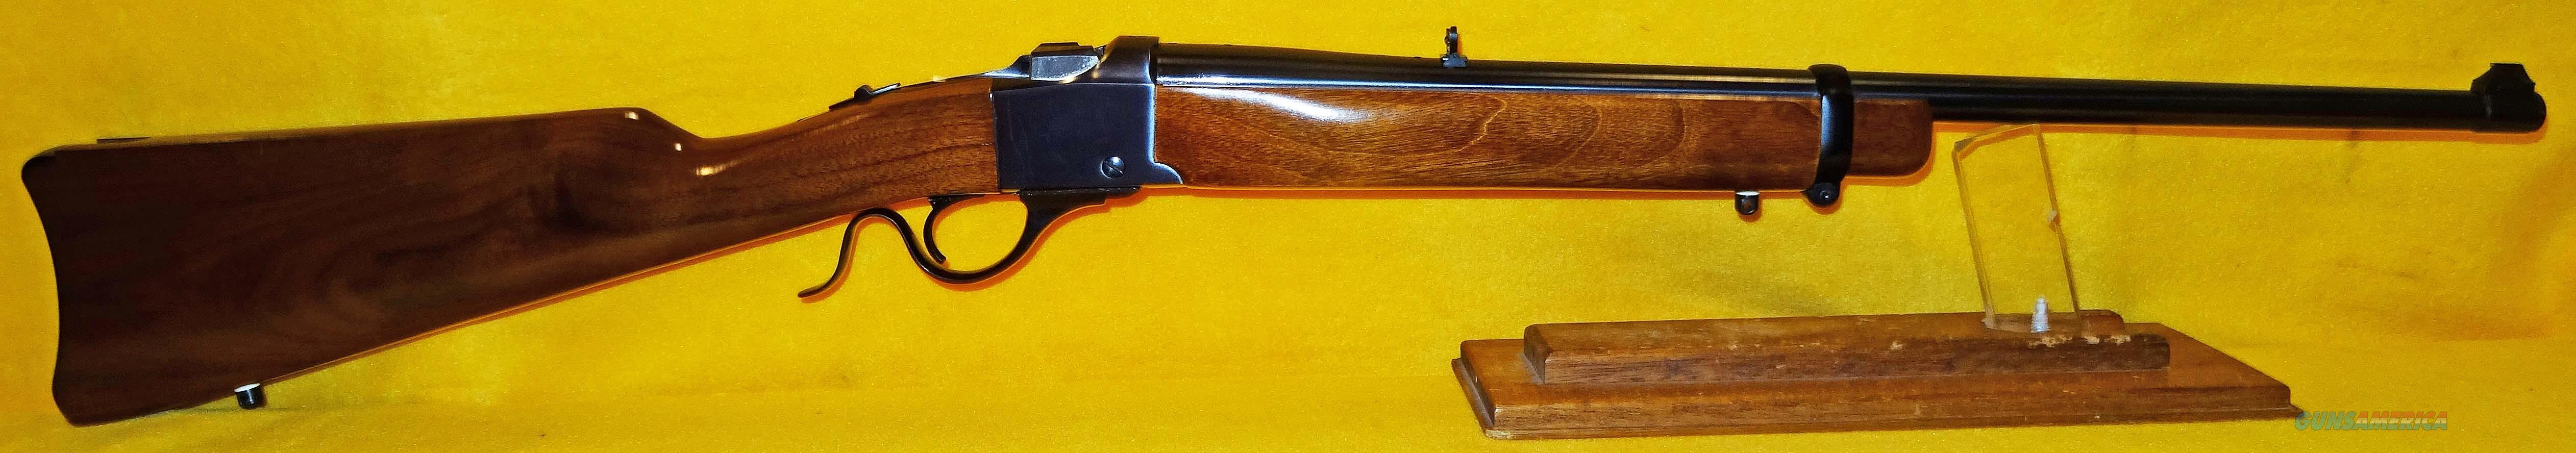 RUGER  NO.3  Guns > Rifles > Ruger Rifles > #1 Type